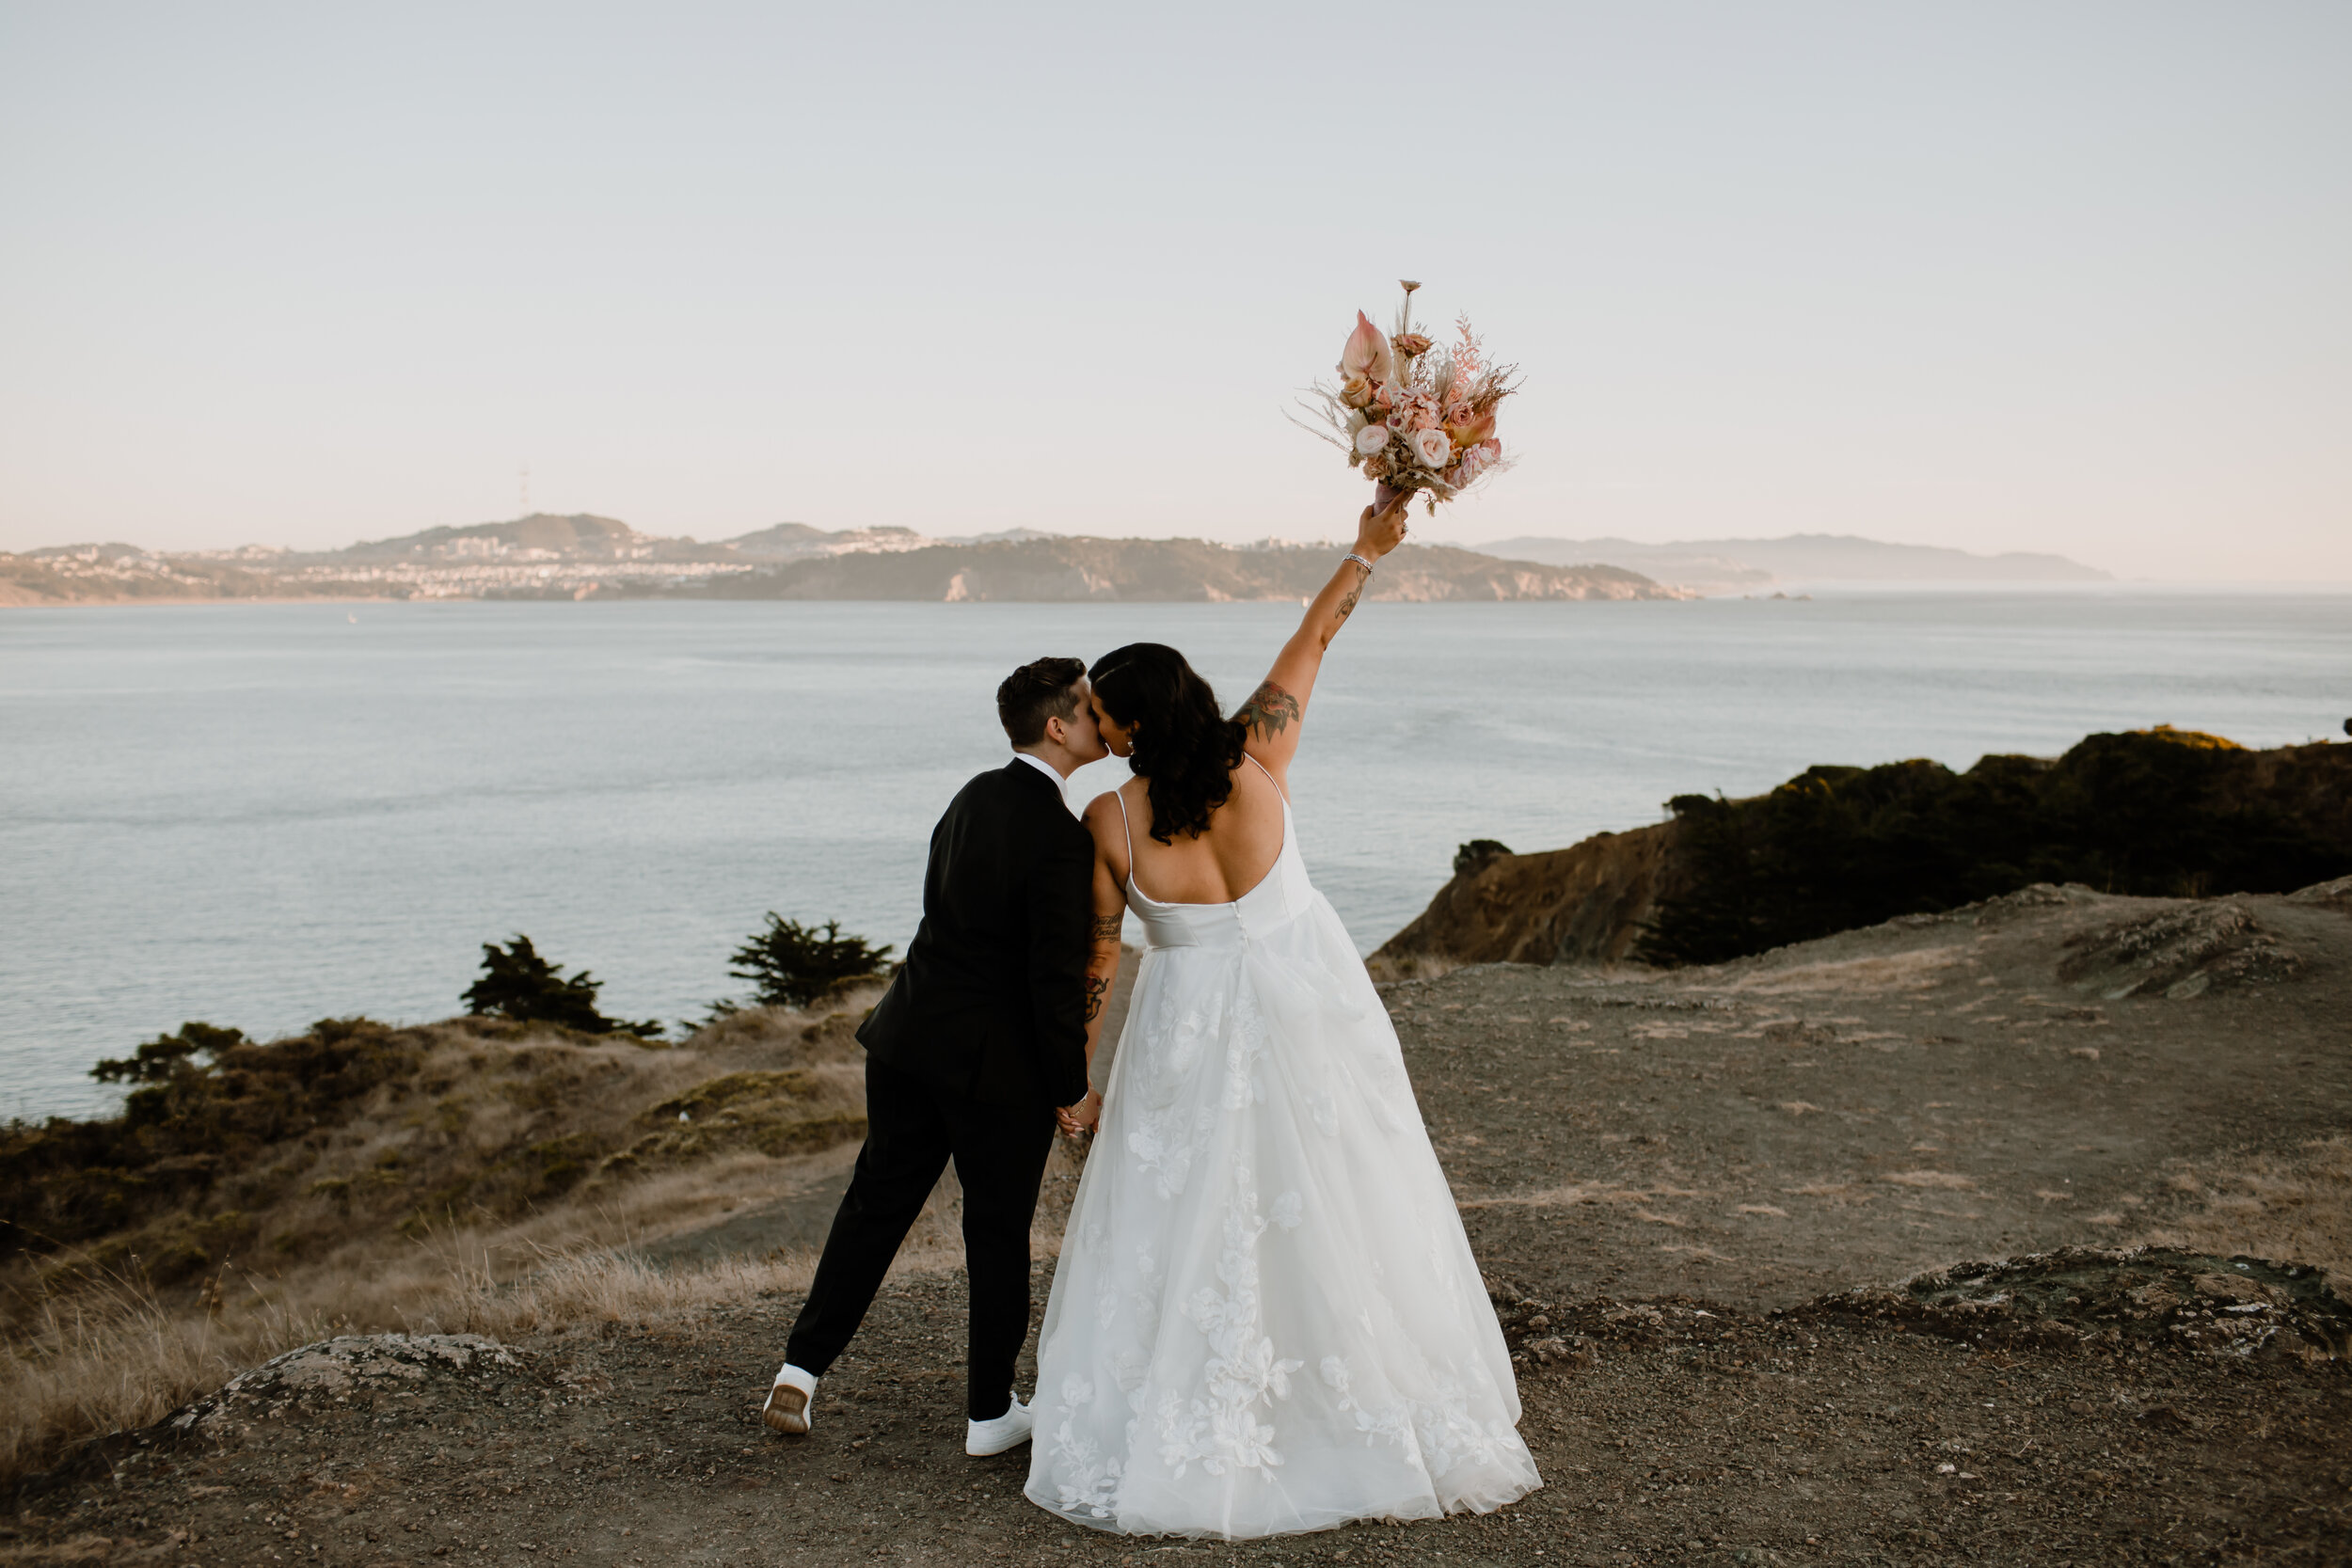 Jenna and Jay Wedding - Eve Rox Photography-108.jpg